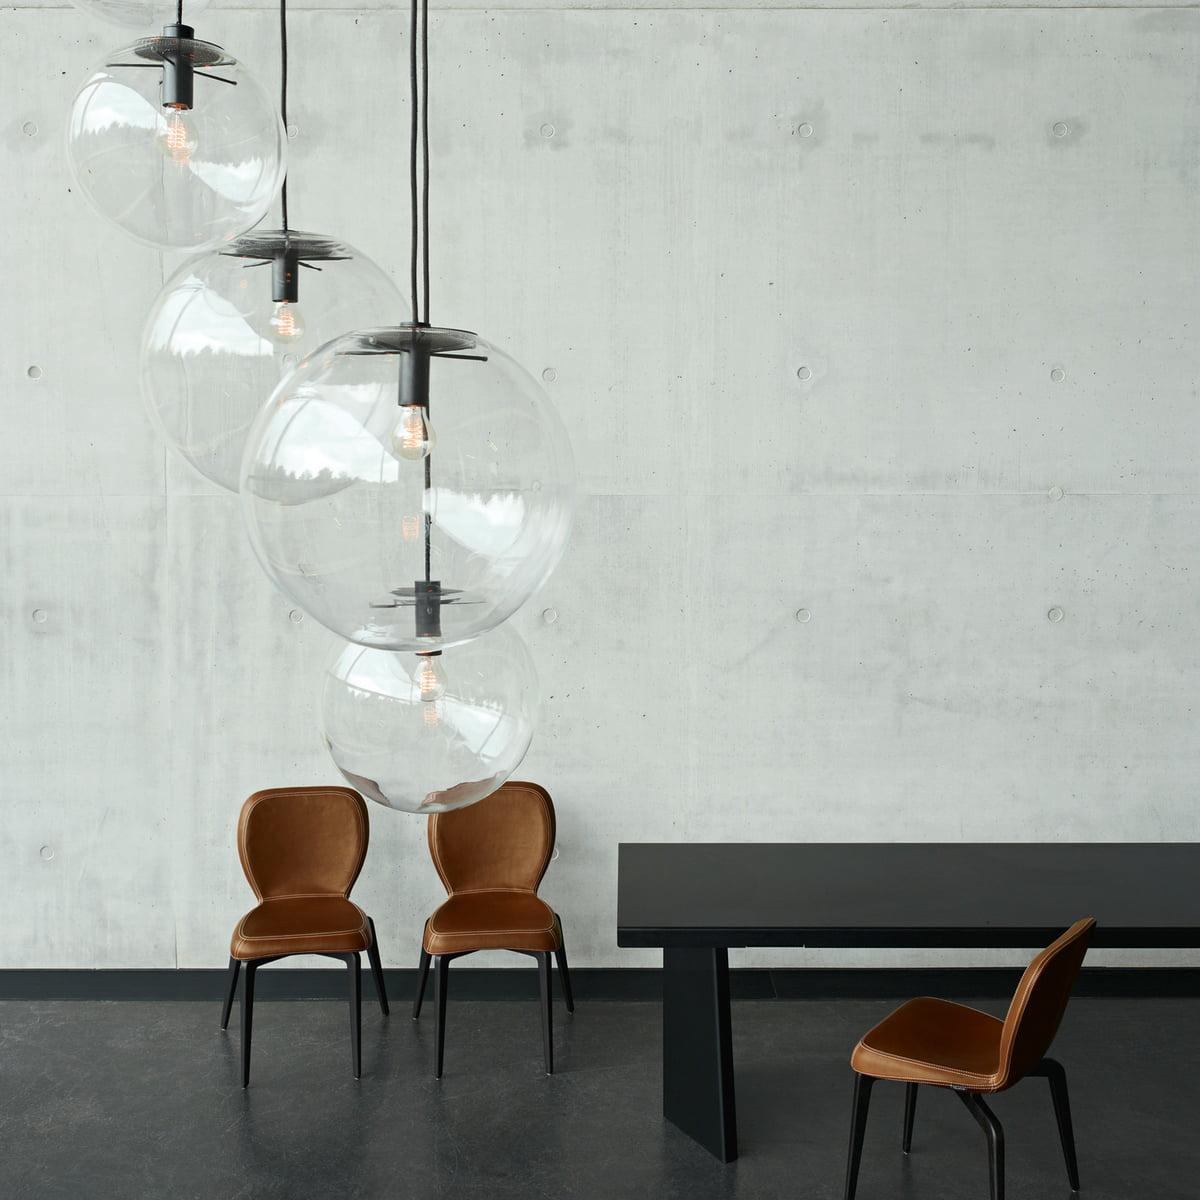 selene pendelleuchte in schwarz von classicon. Black Bedroom Furniture Sets. Home Design Ideas